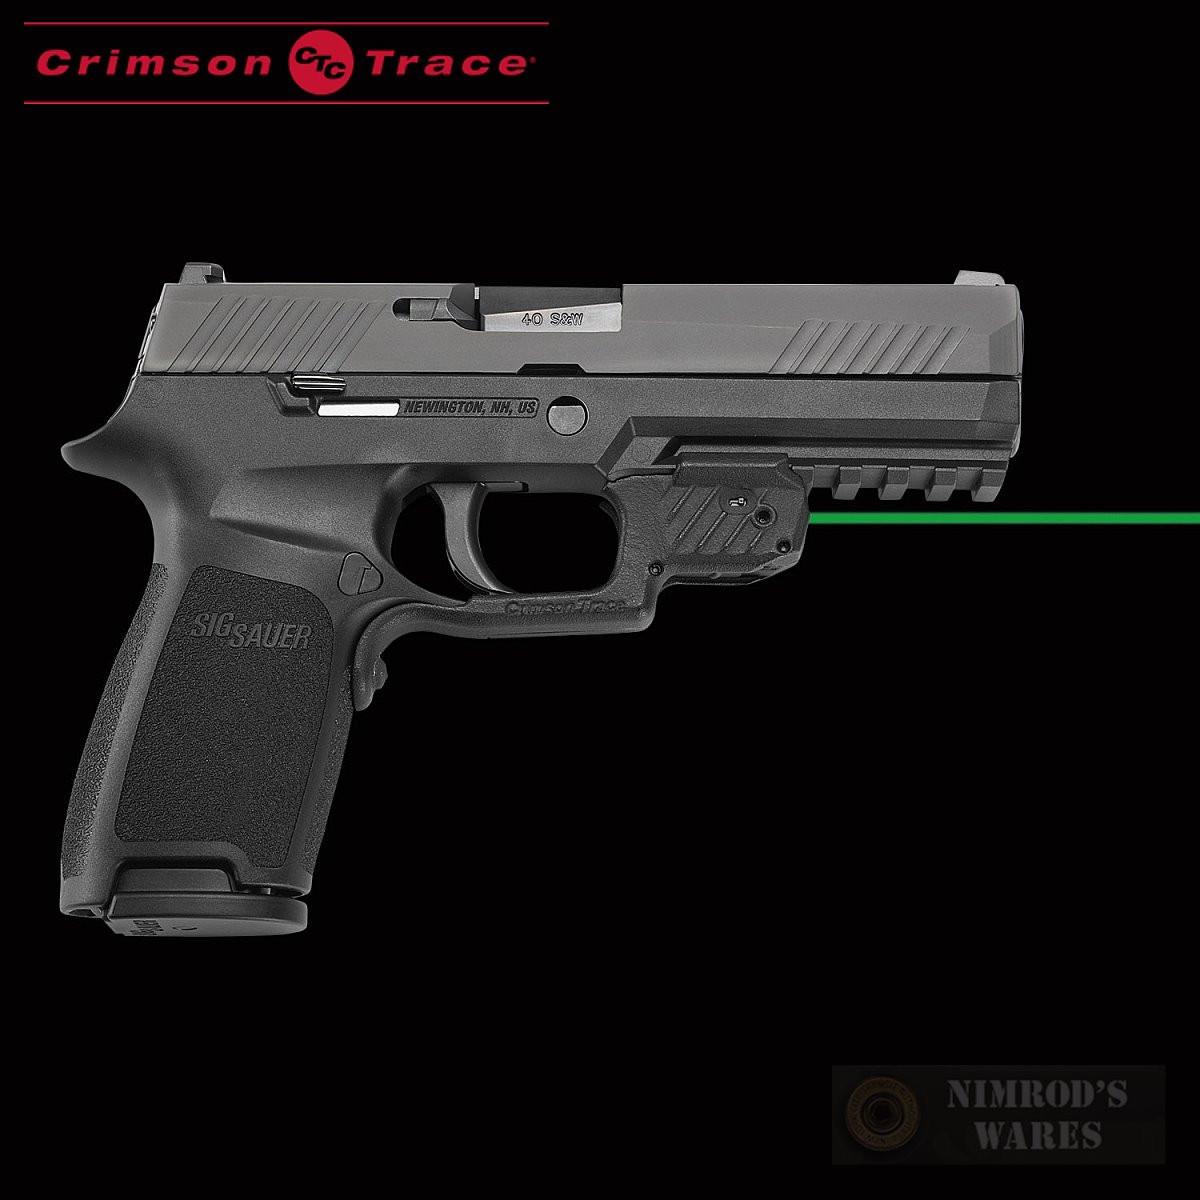 Crimson Trace SIG SAUER P320 M17 M18 Laserguard GREEN SIGHT LG-420G